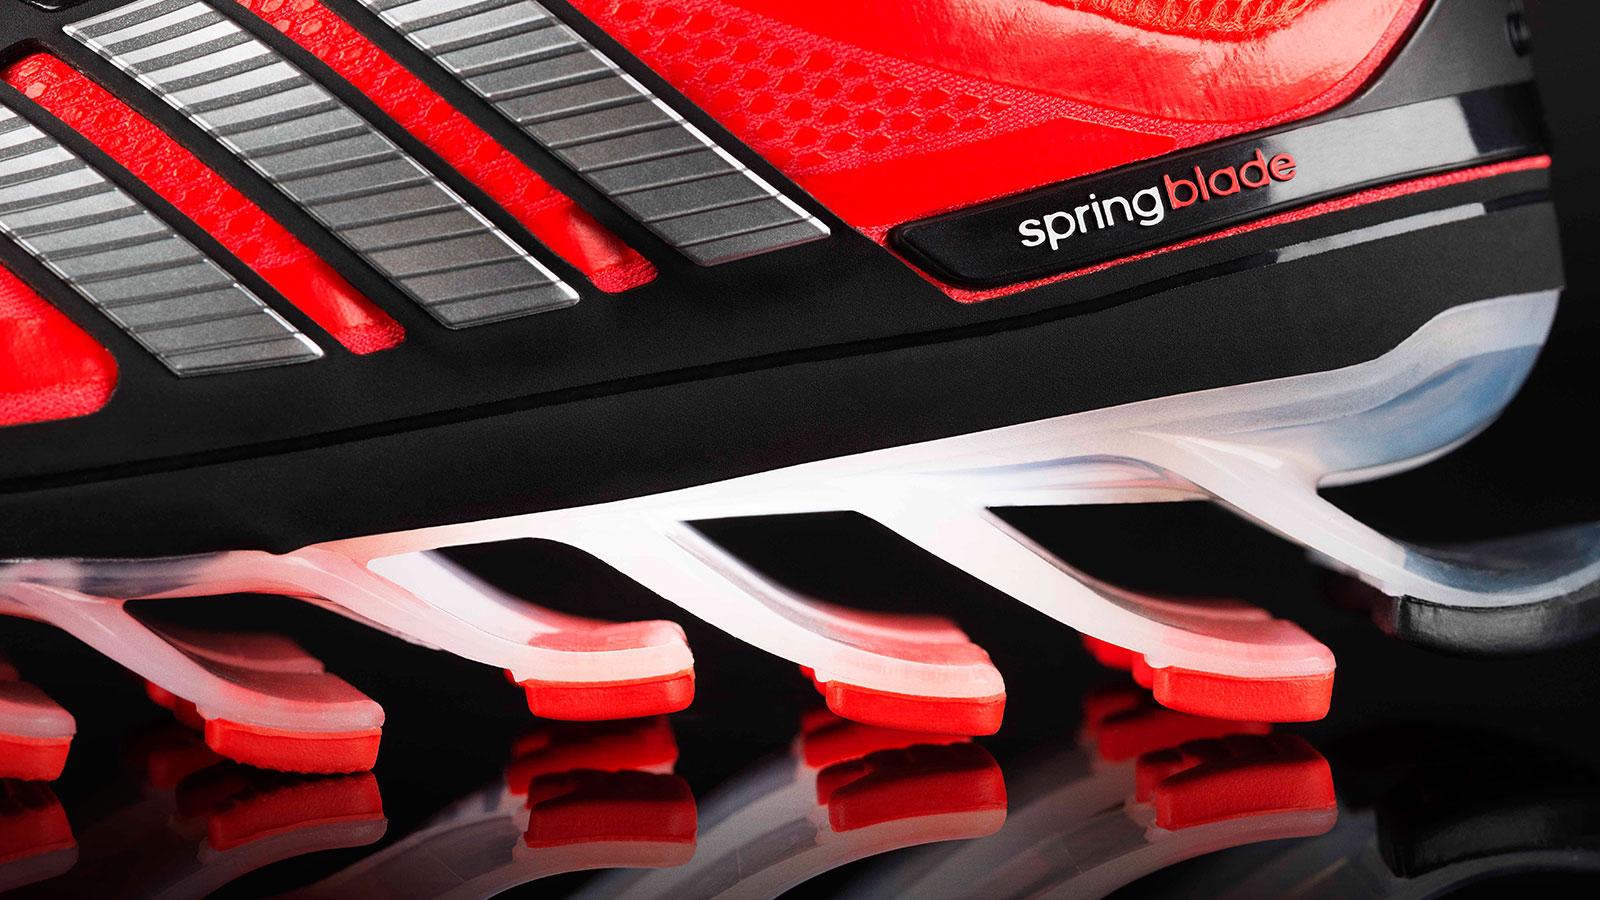 Heal of adidas Springblade shoe